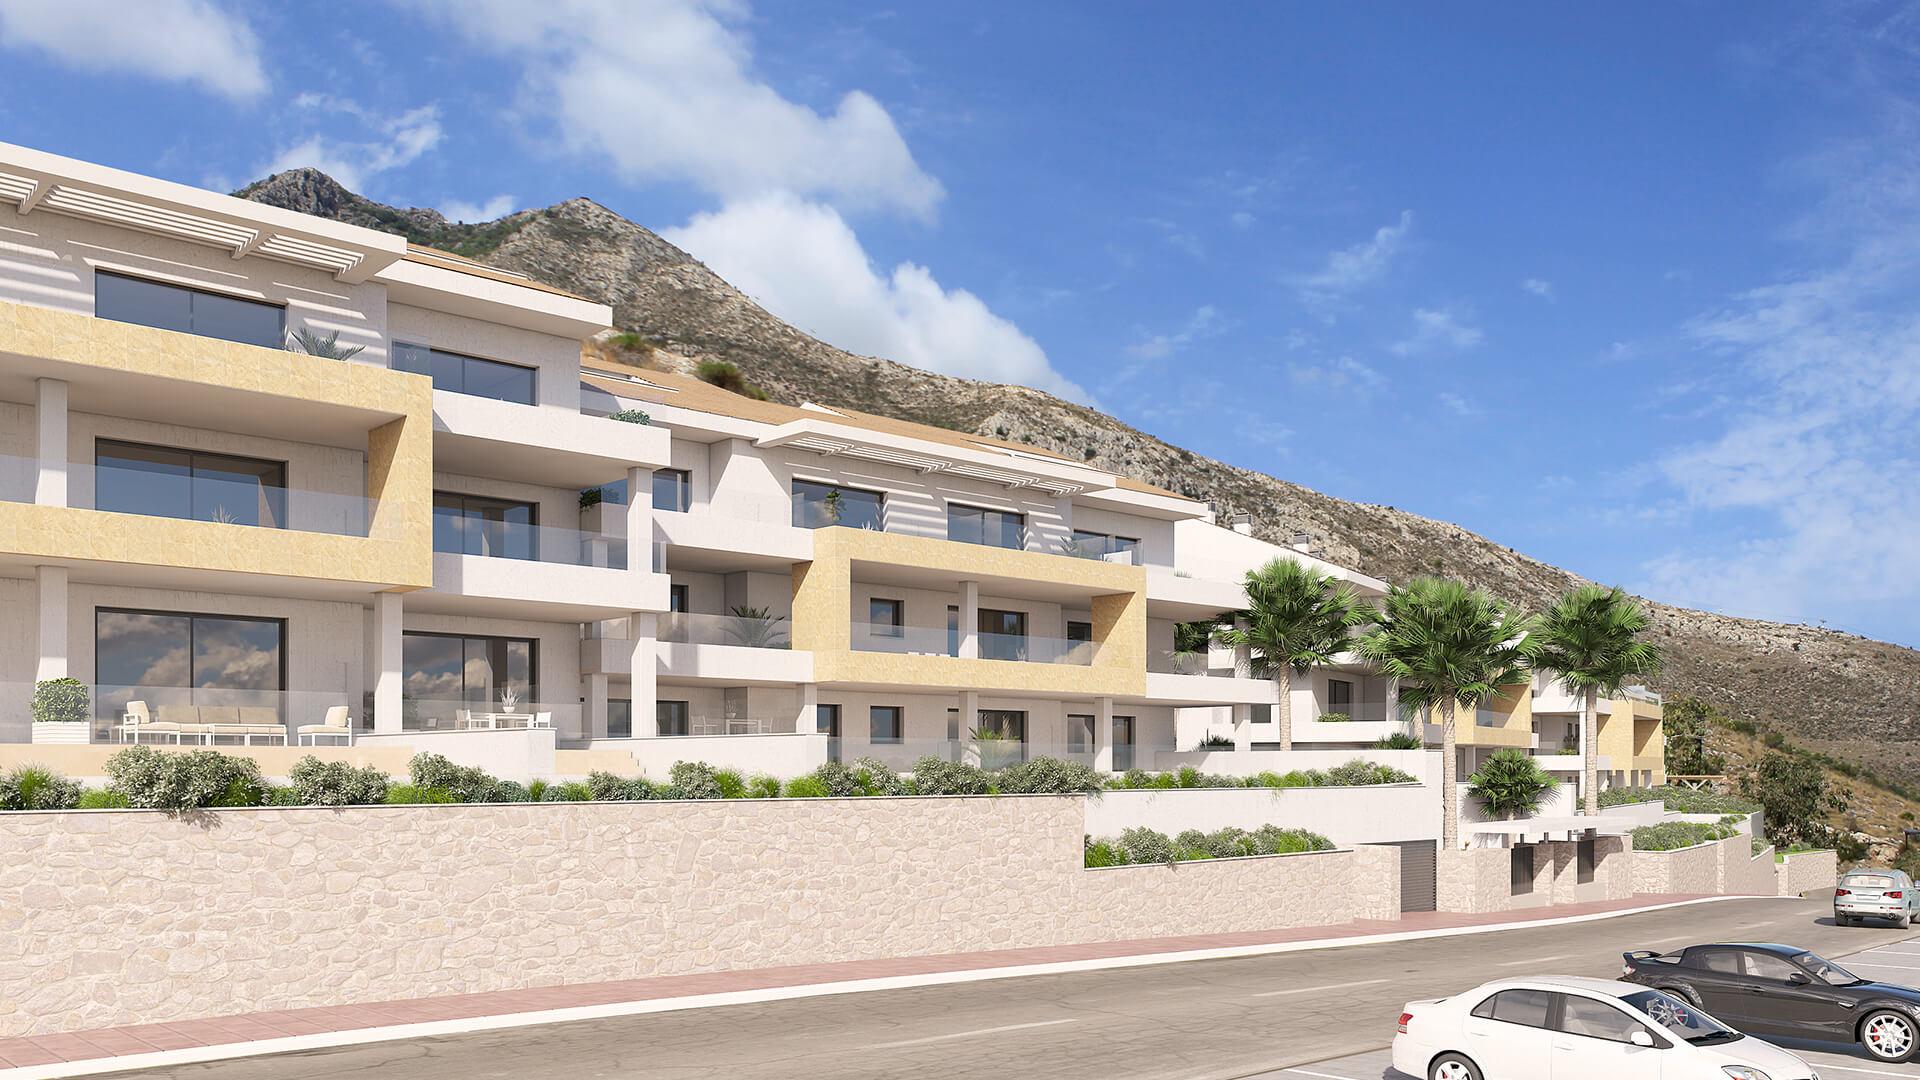 Apartment in Benalmadena MA2580293 4